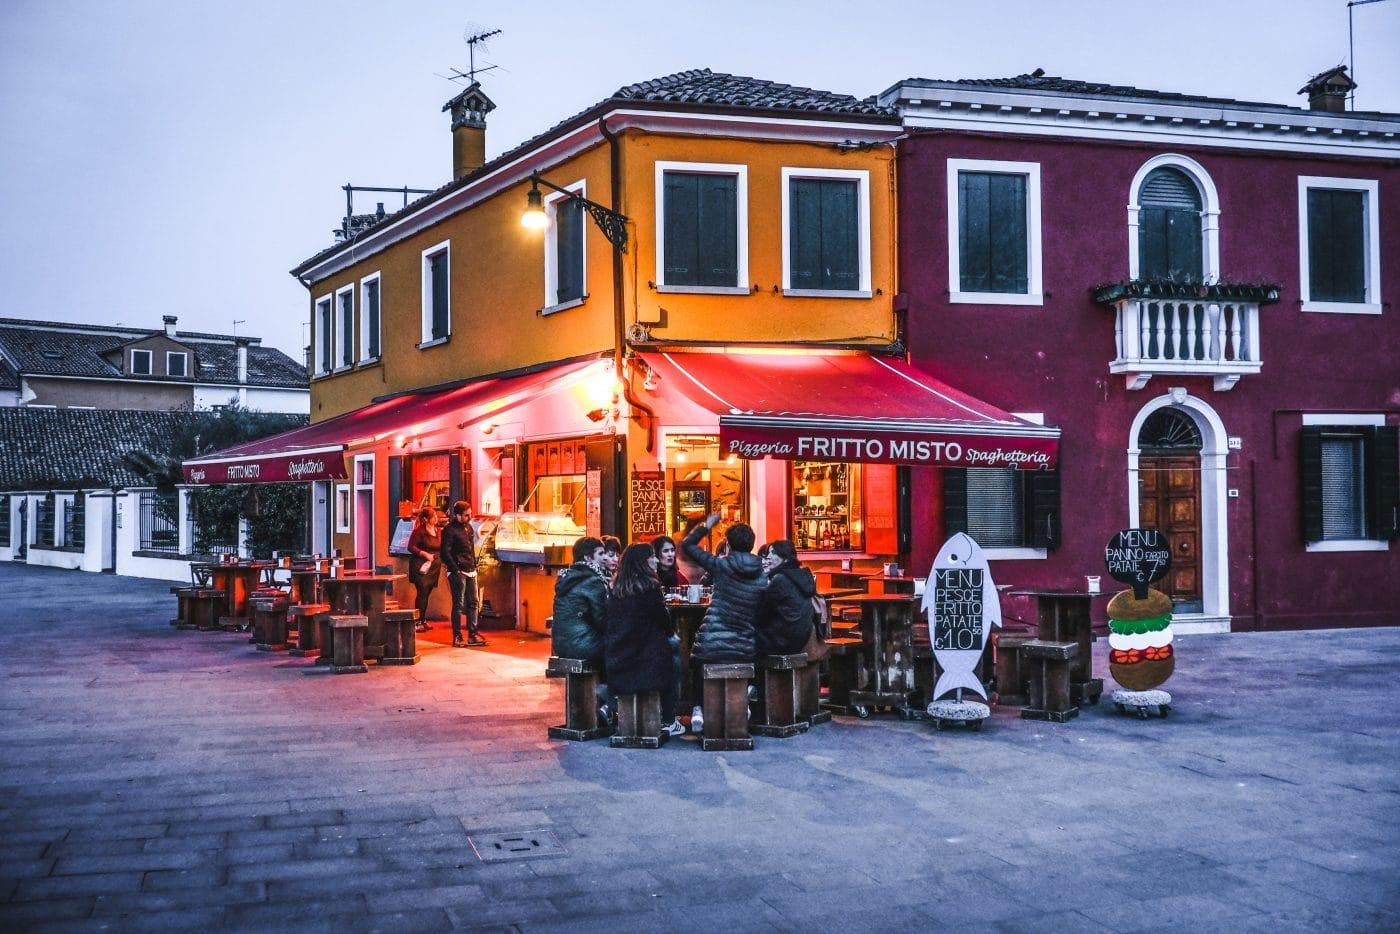 CiN CiN: Cheers from Venice